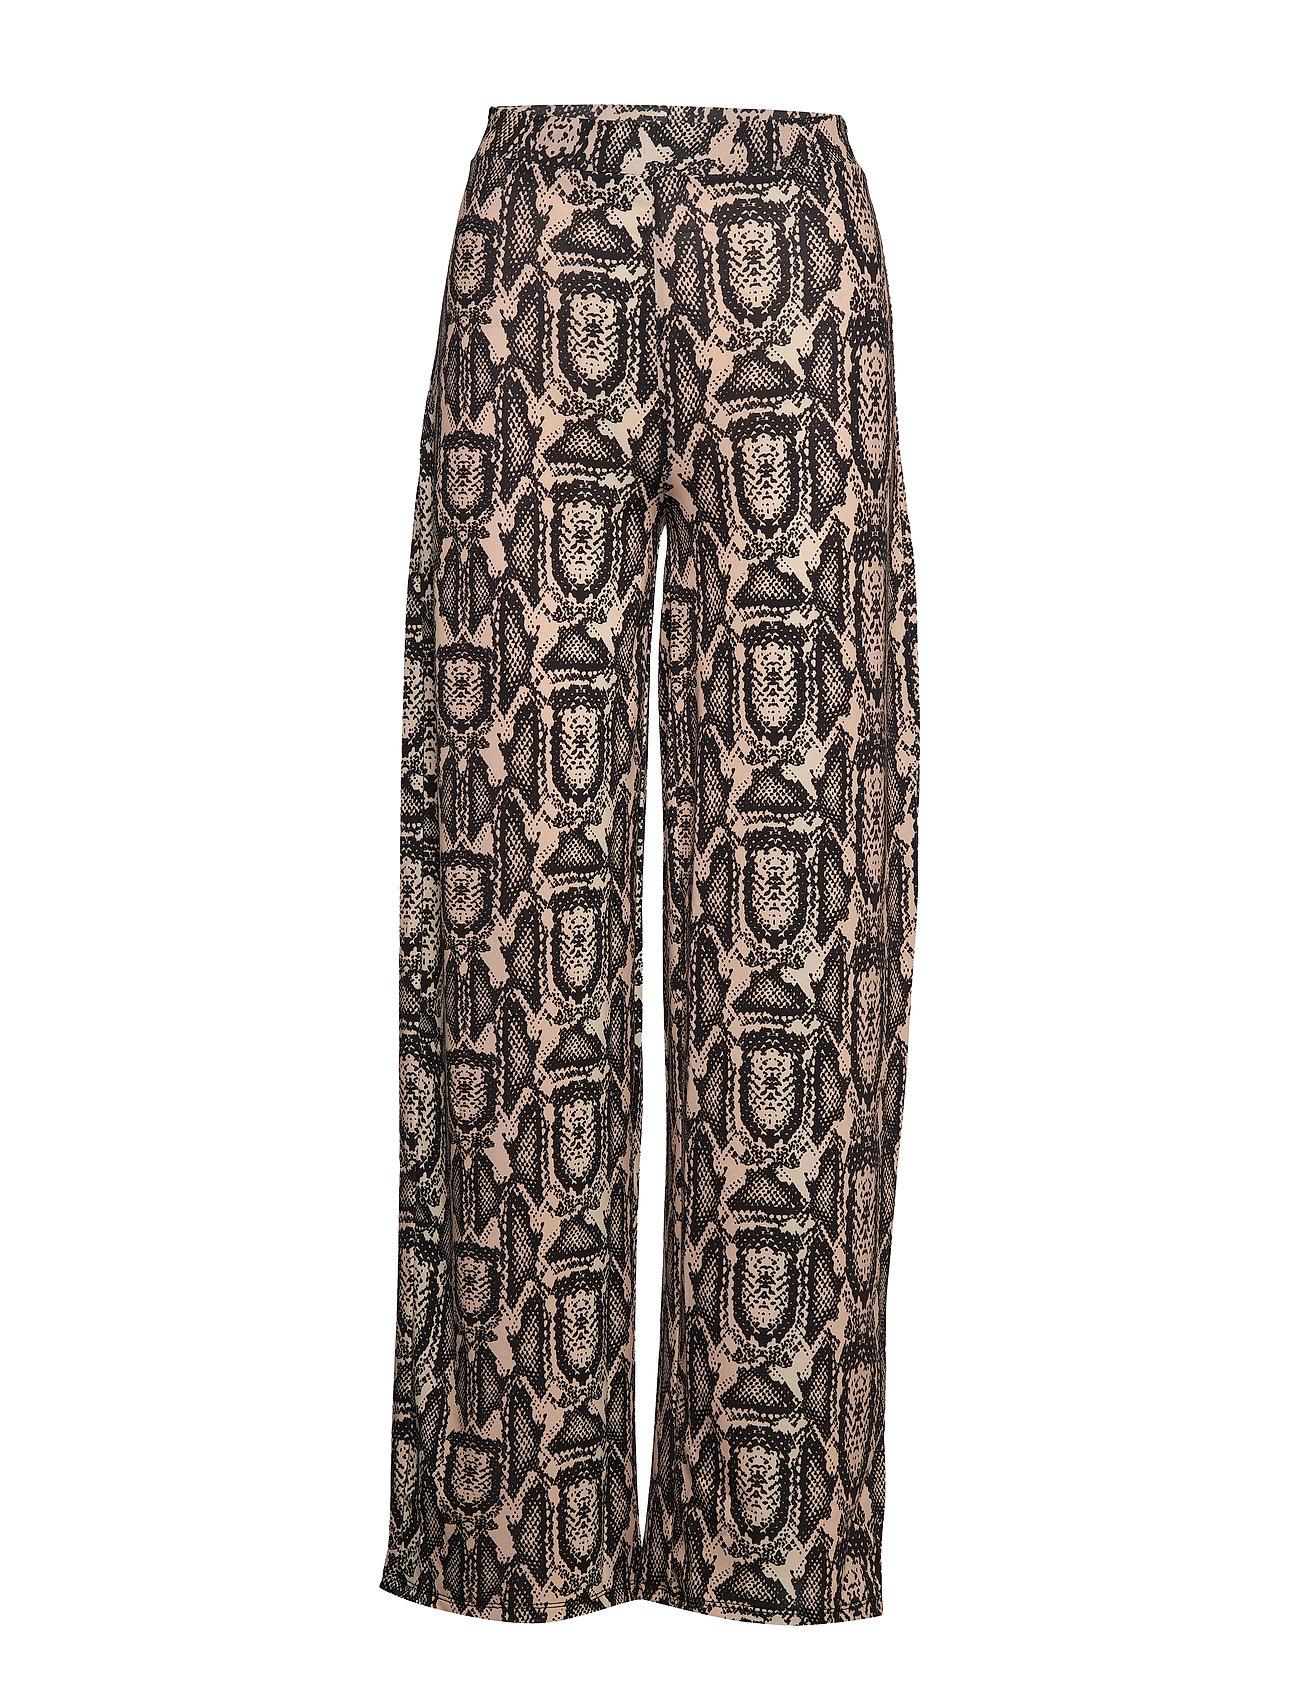 Ivyrevel SHINY WIDE LEG PANTS - BEIGE SNAKE